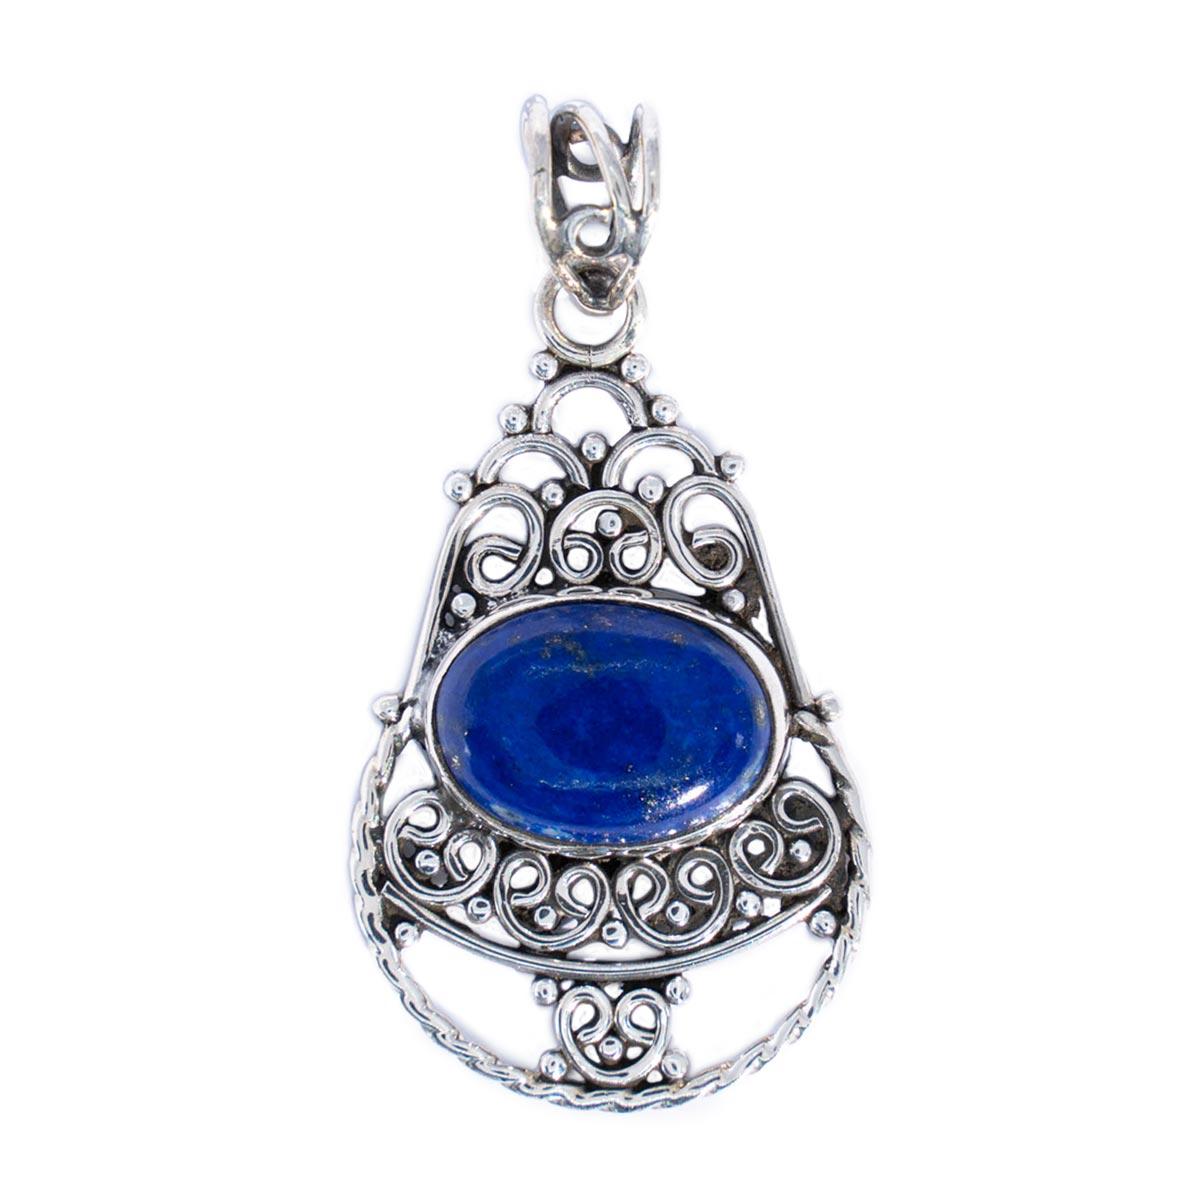 Sri Avinash Infused™ Lapis Lazuli Pendant in Sterling Silver - Lightness & Joy Infusion